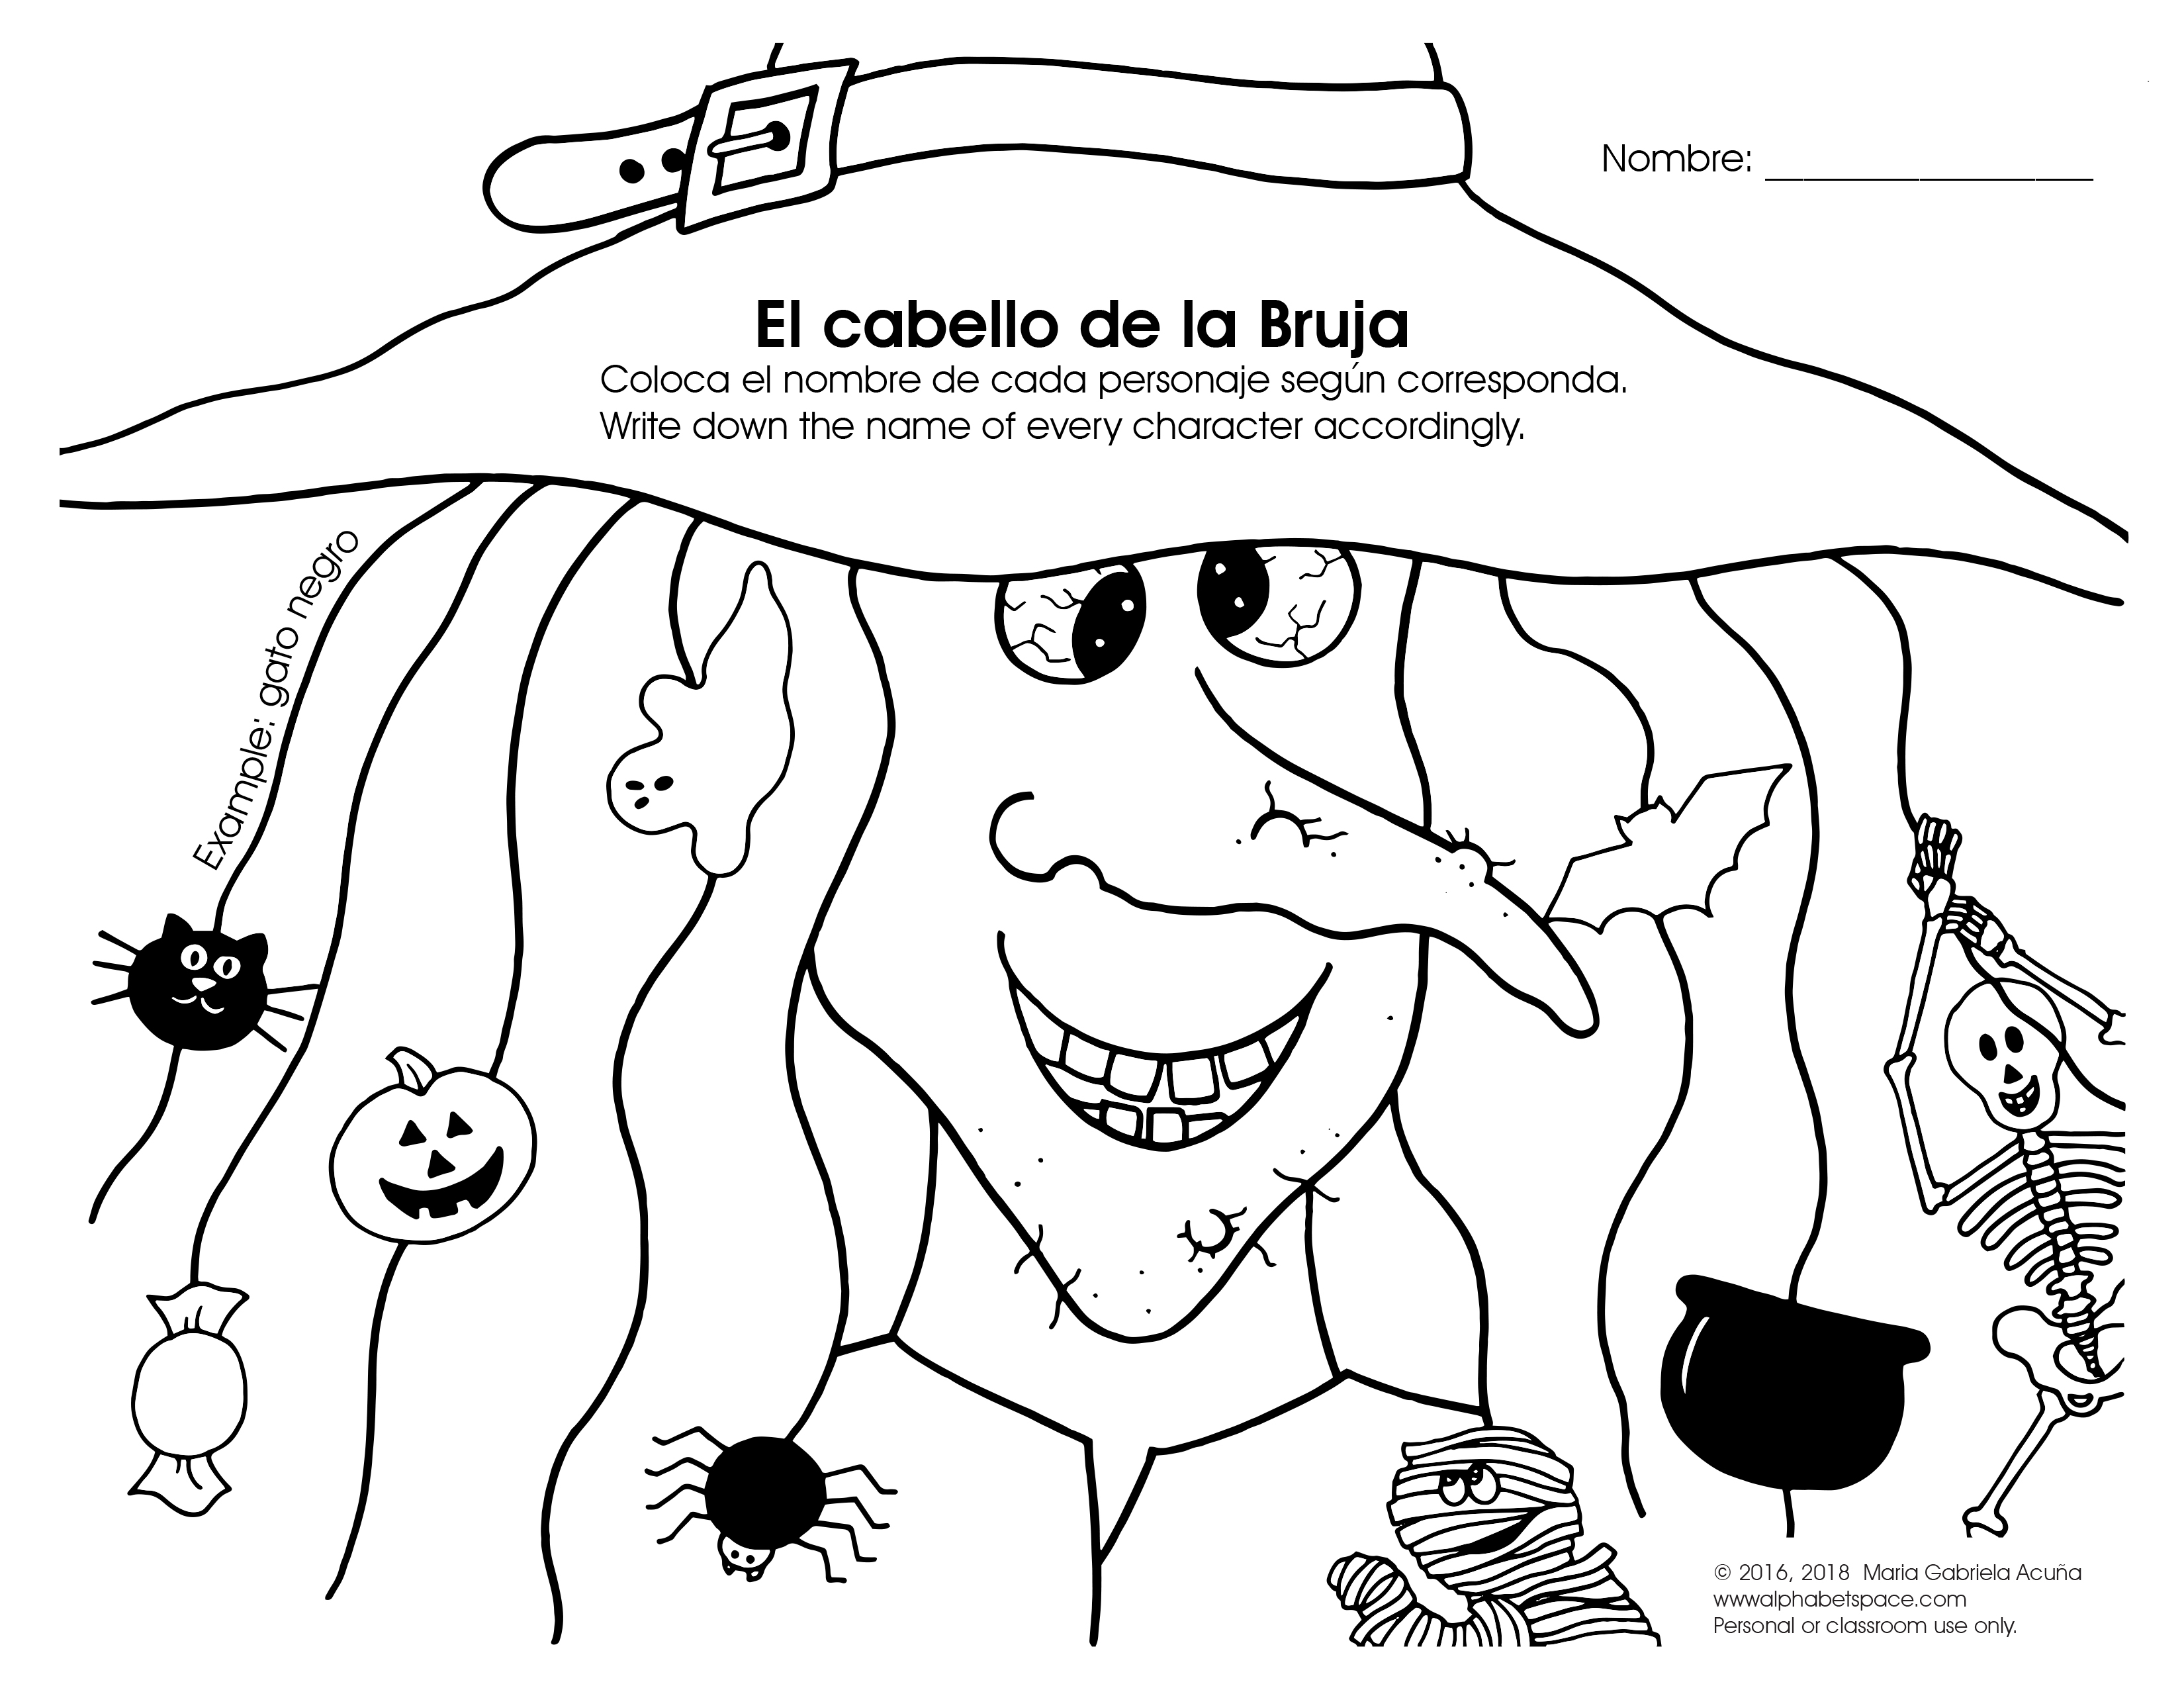 EL Cabello de la Bruja Worksheet.jpg